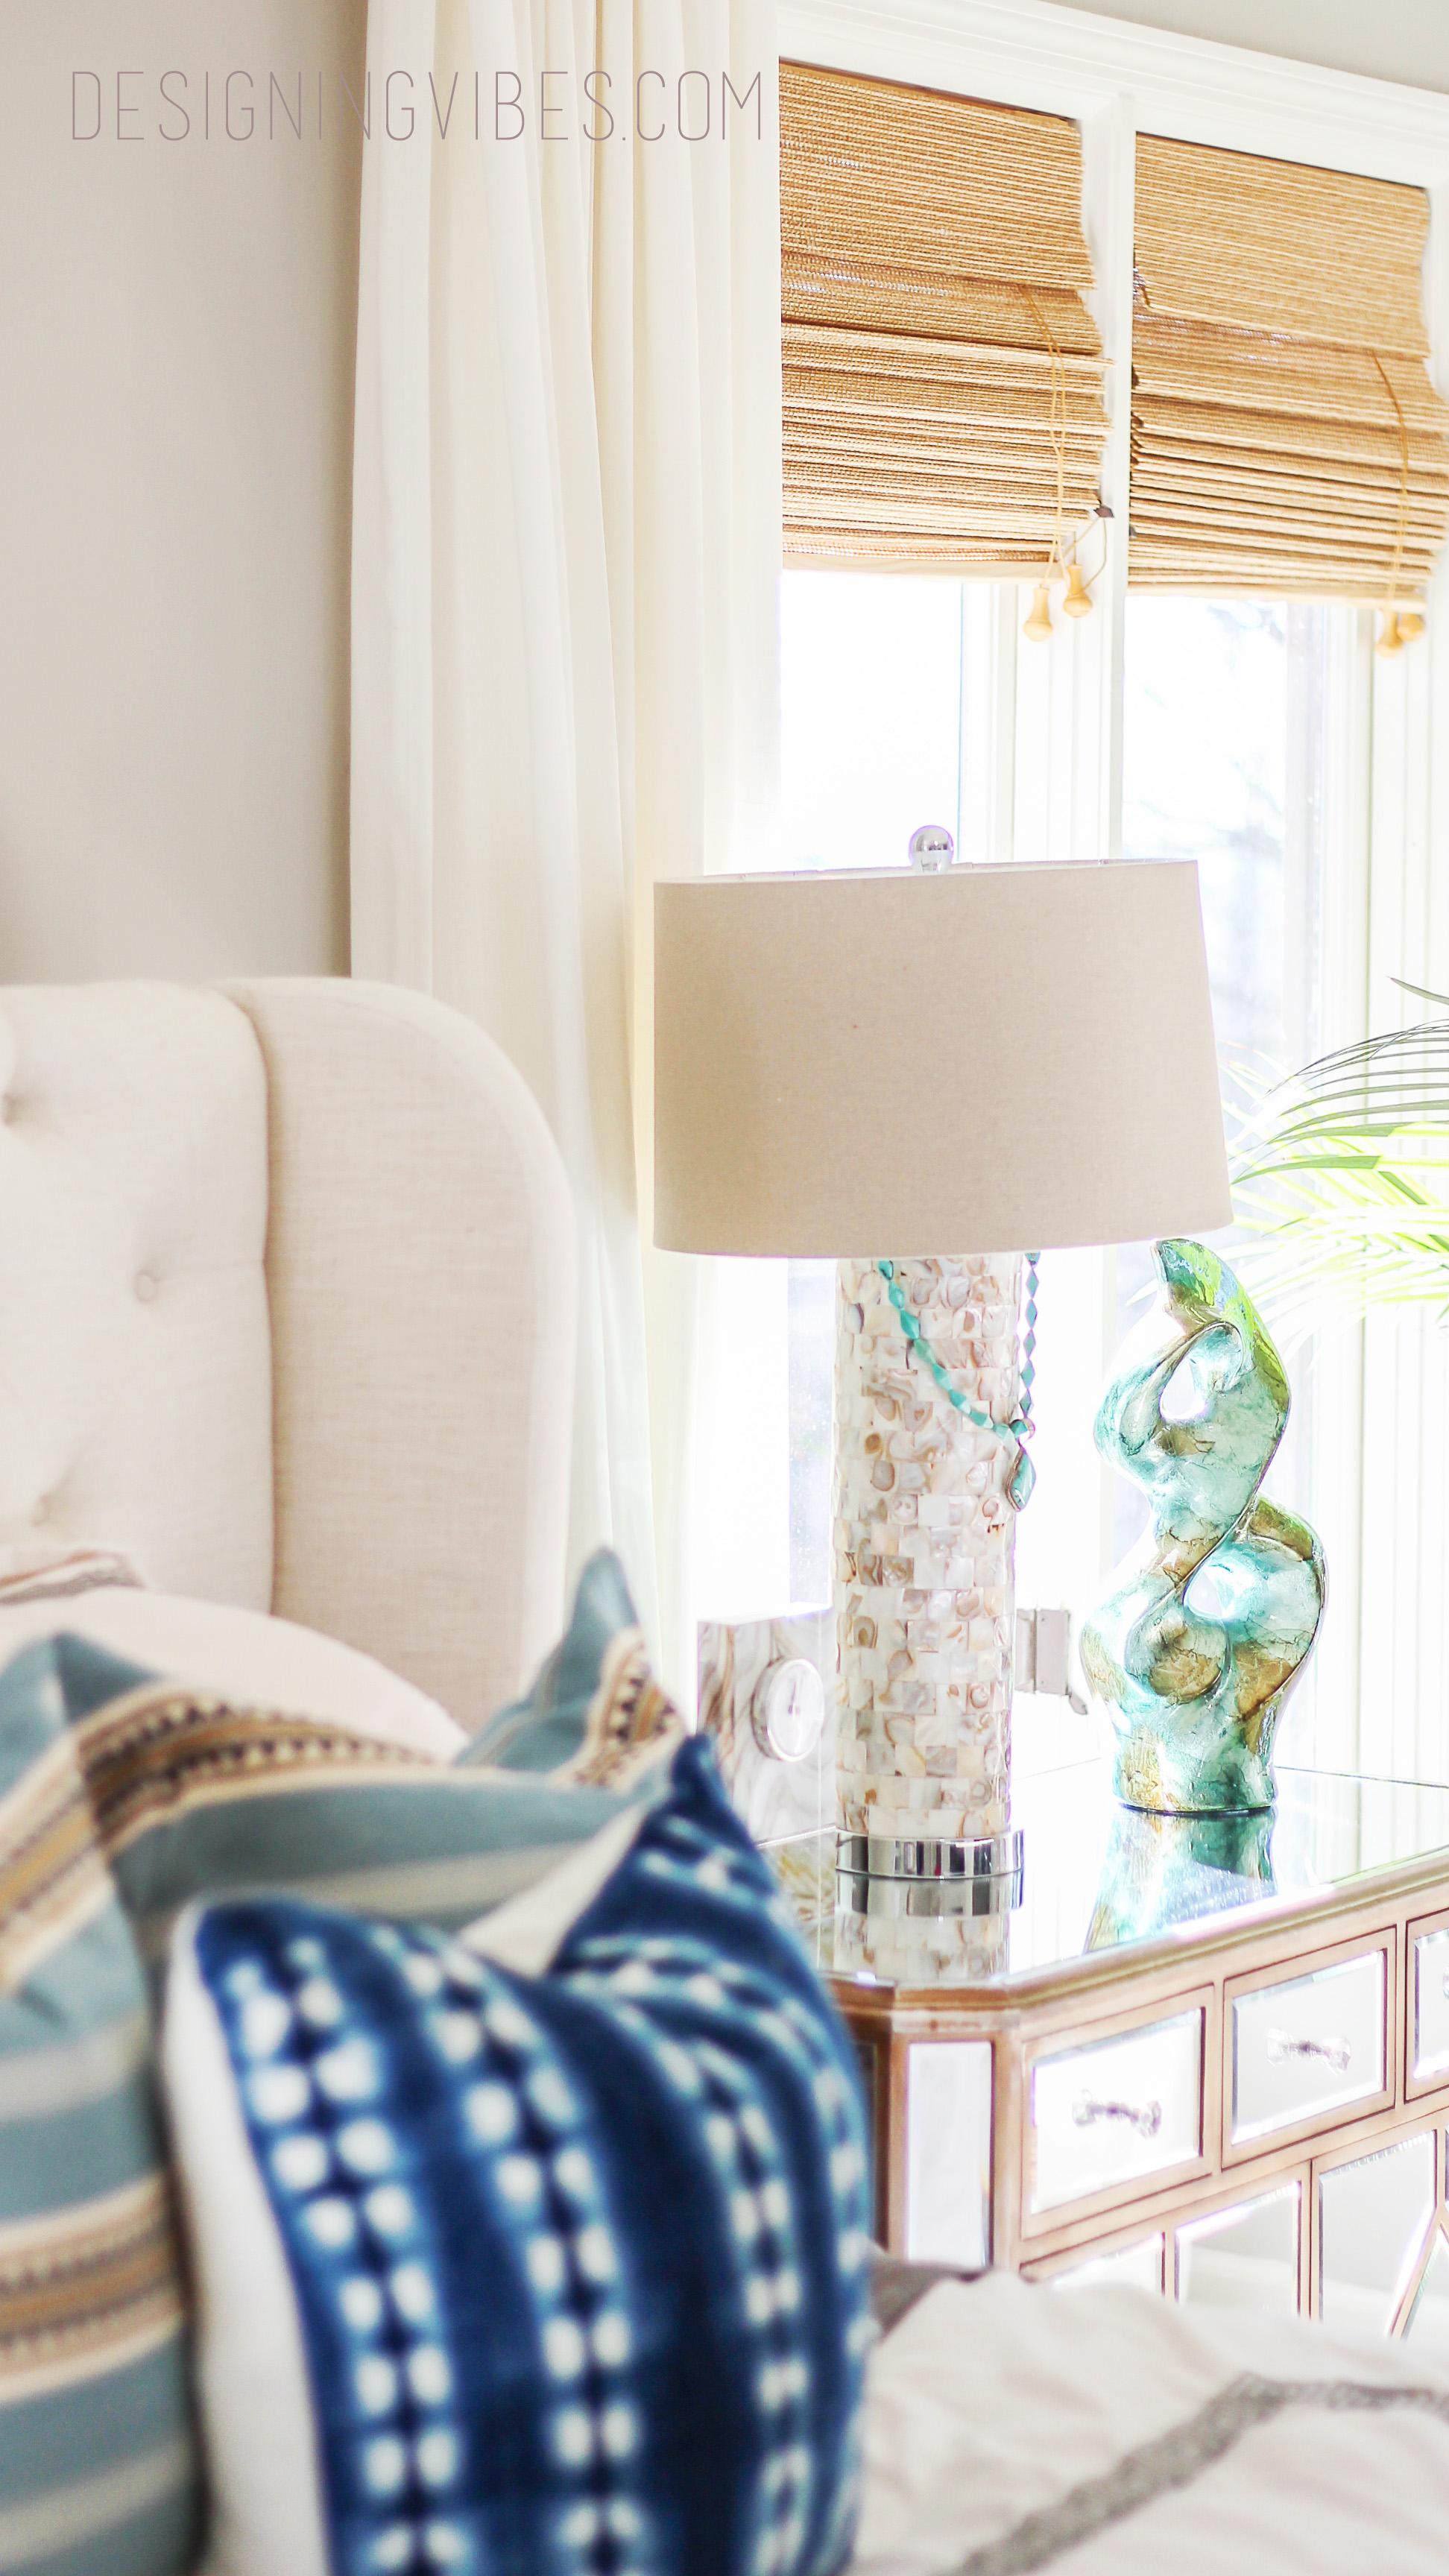 Boho Chic Bedroom Reveal Part 1 Interior Design